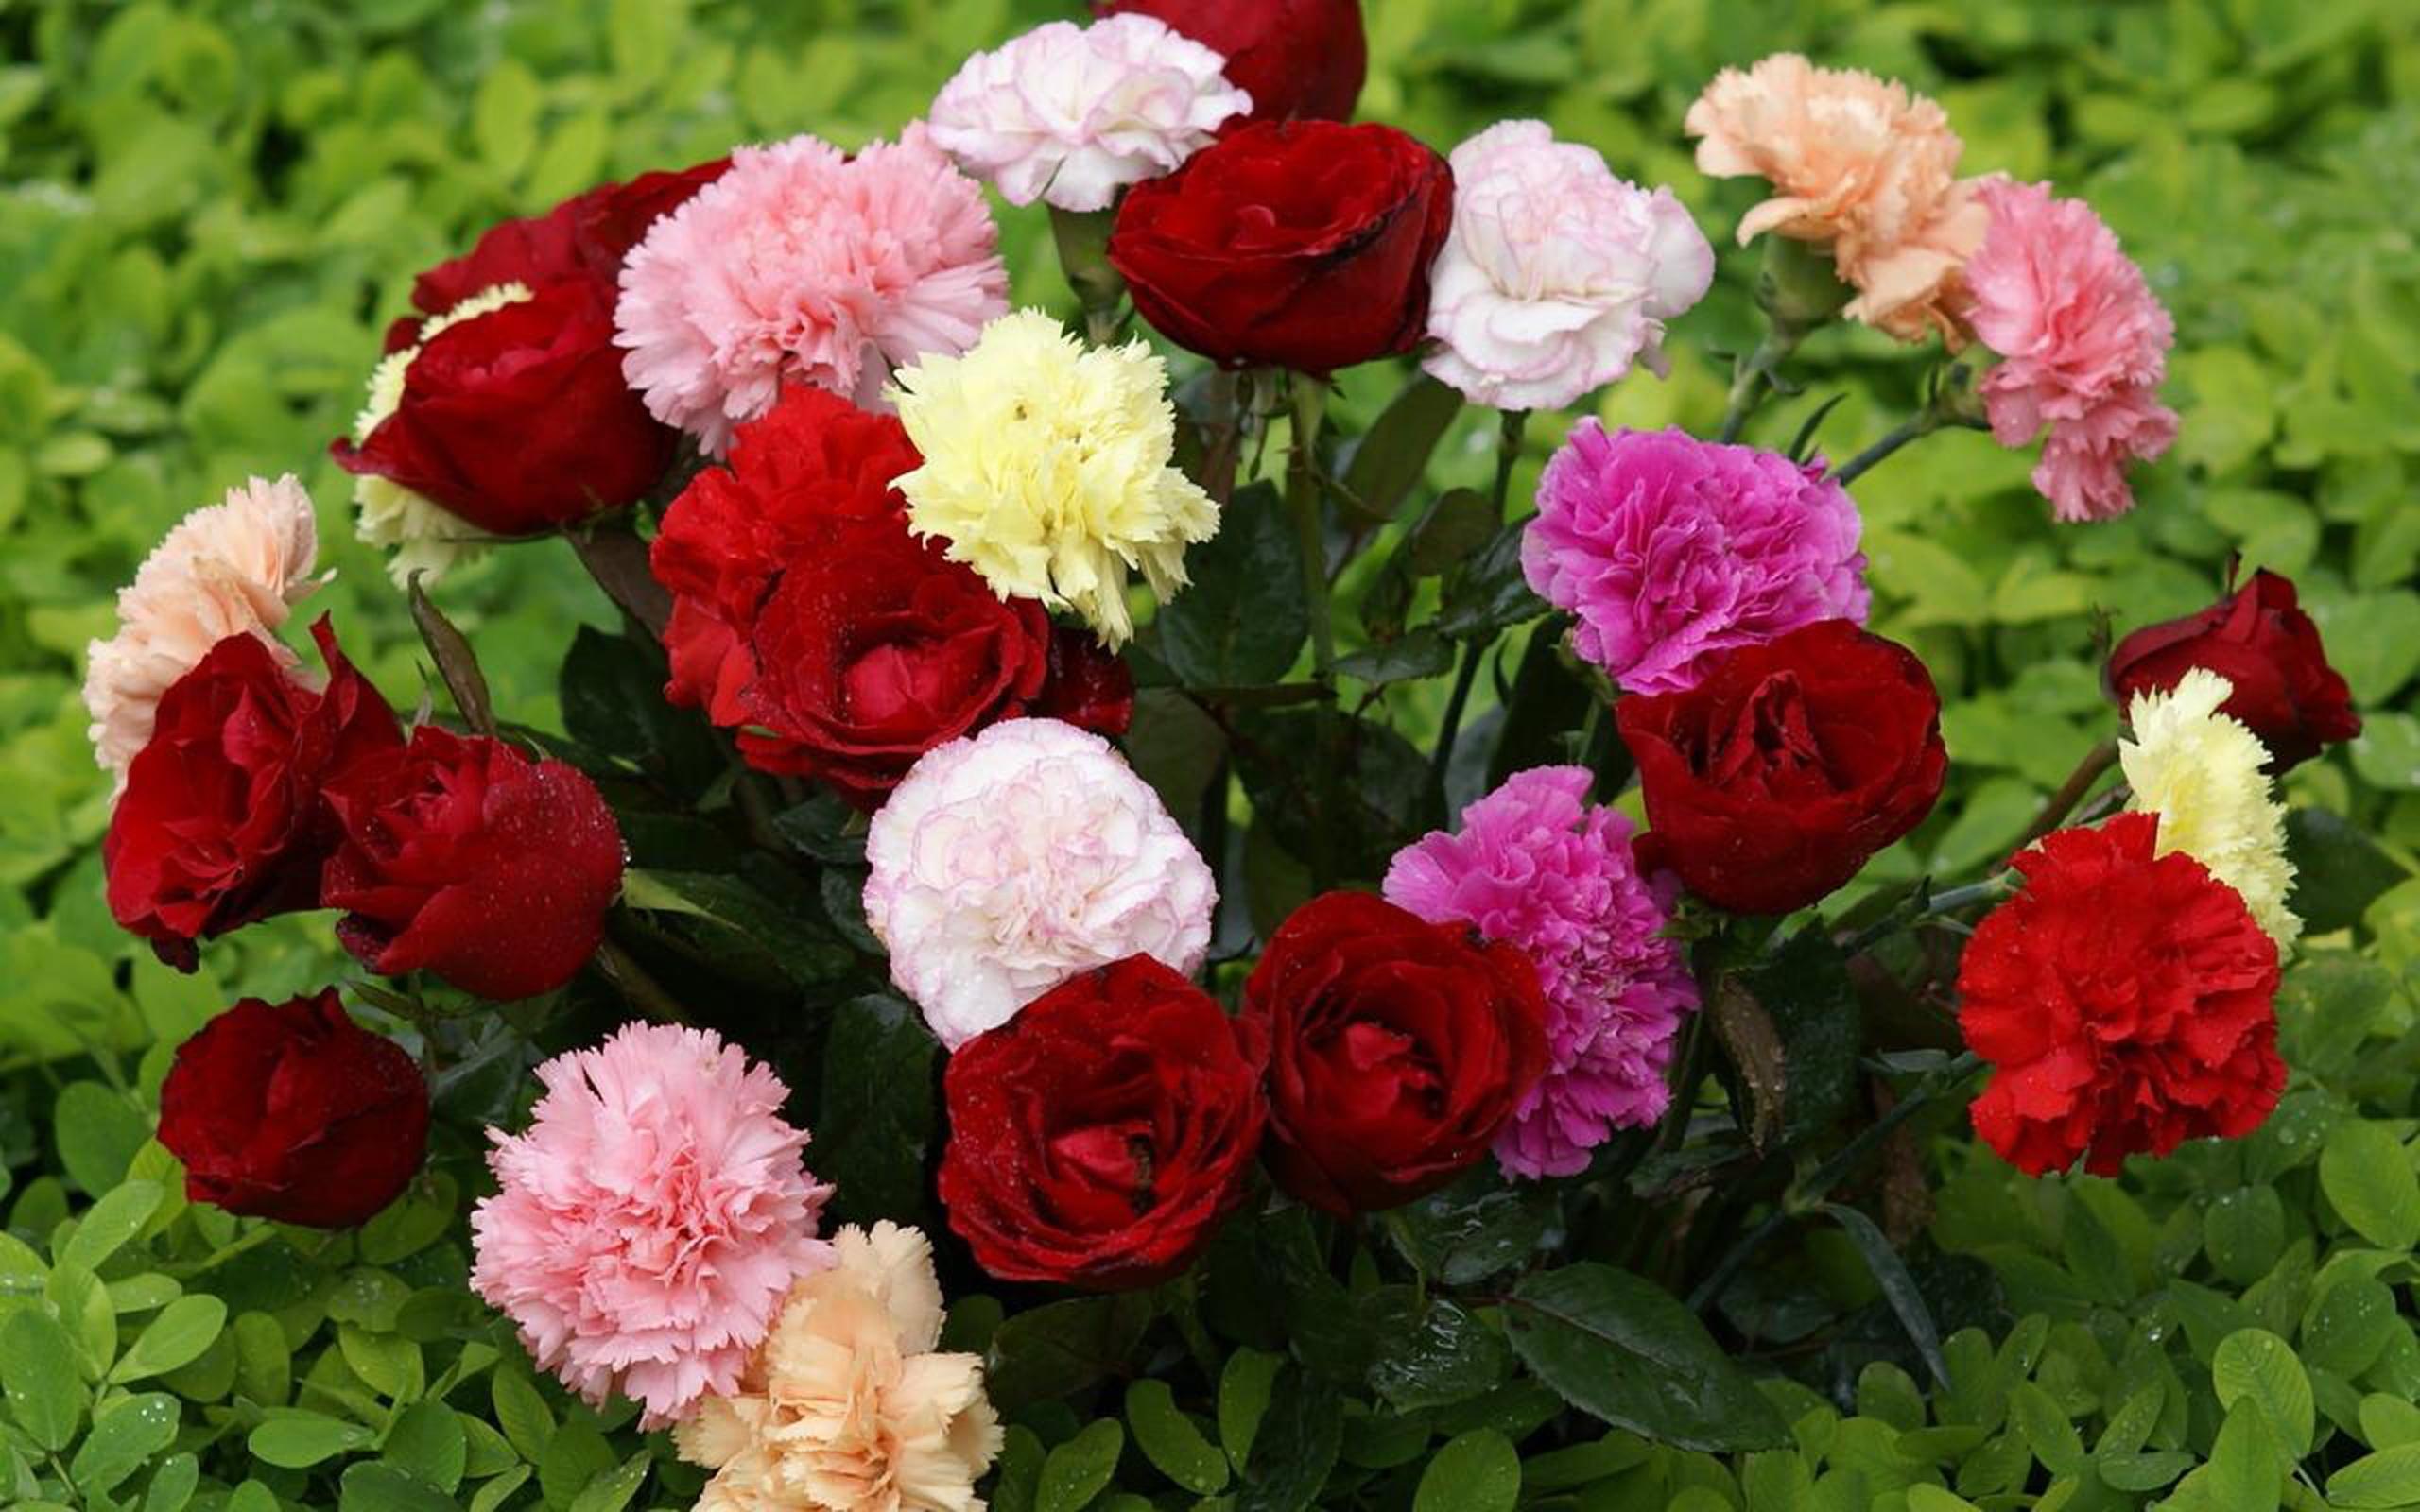 Beautiful Flowers Pic Hd 2560x1600 Download Hd Wallpaper Wallpapertip